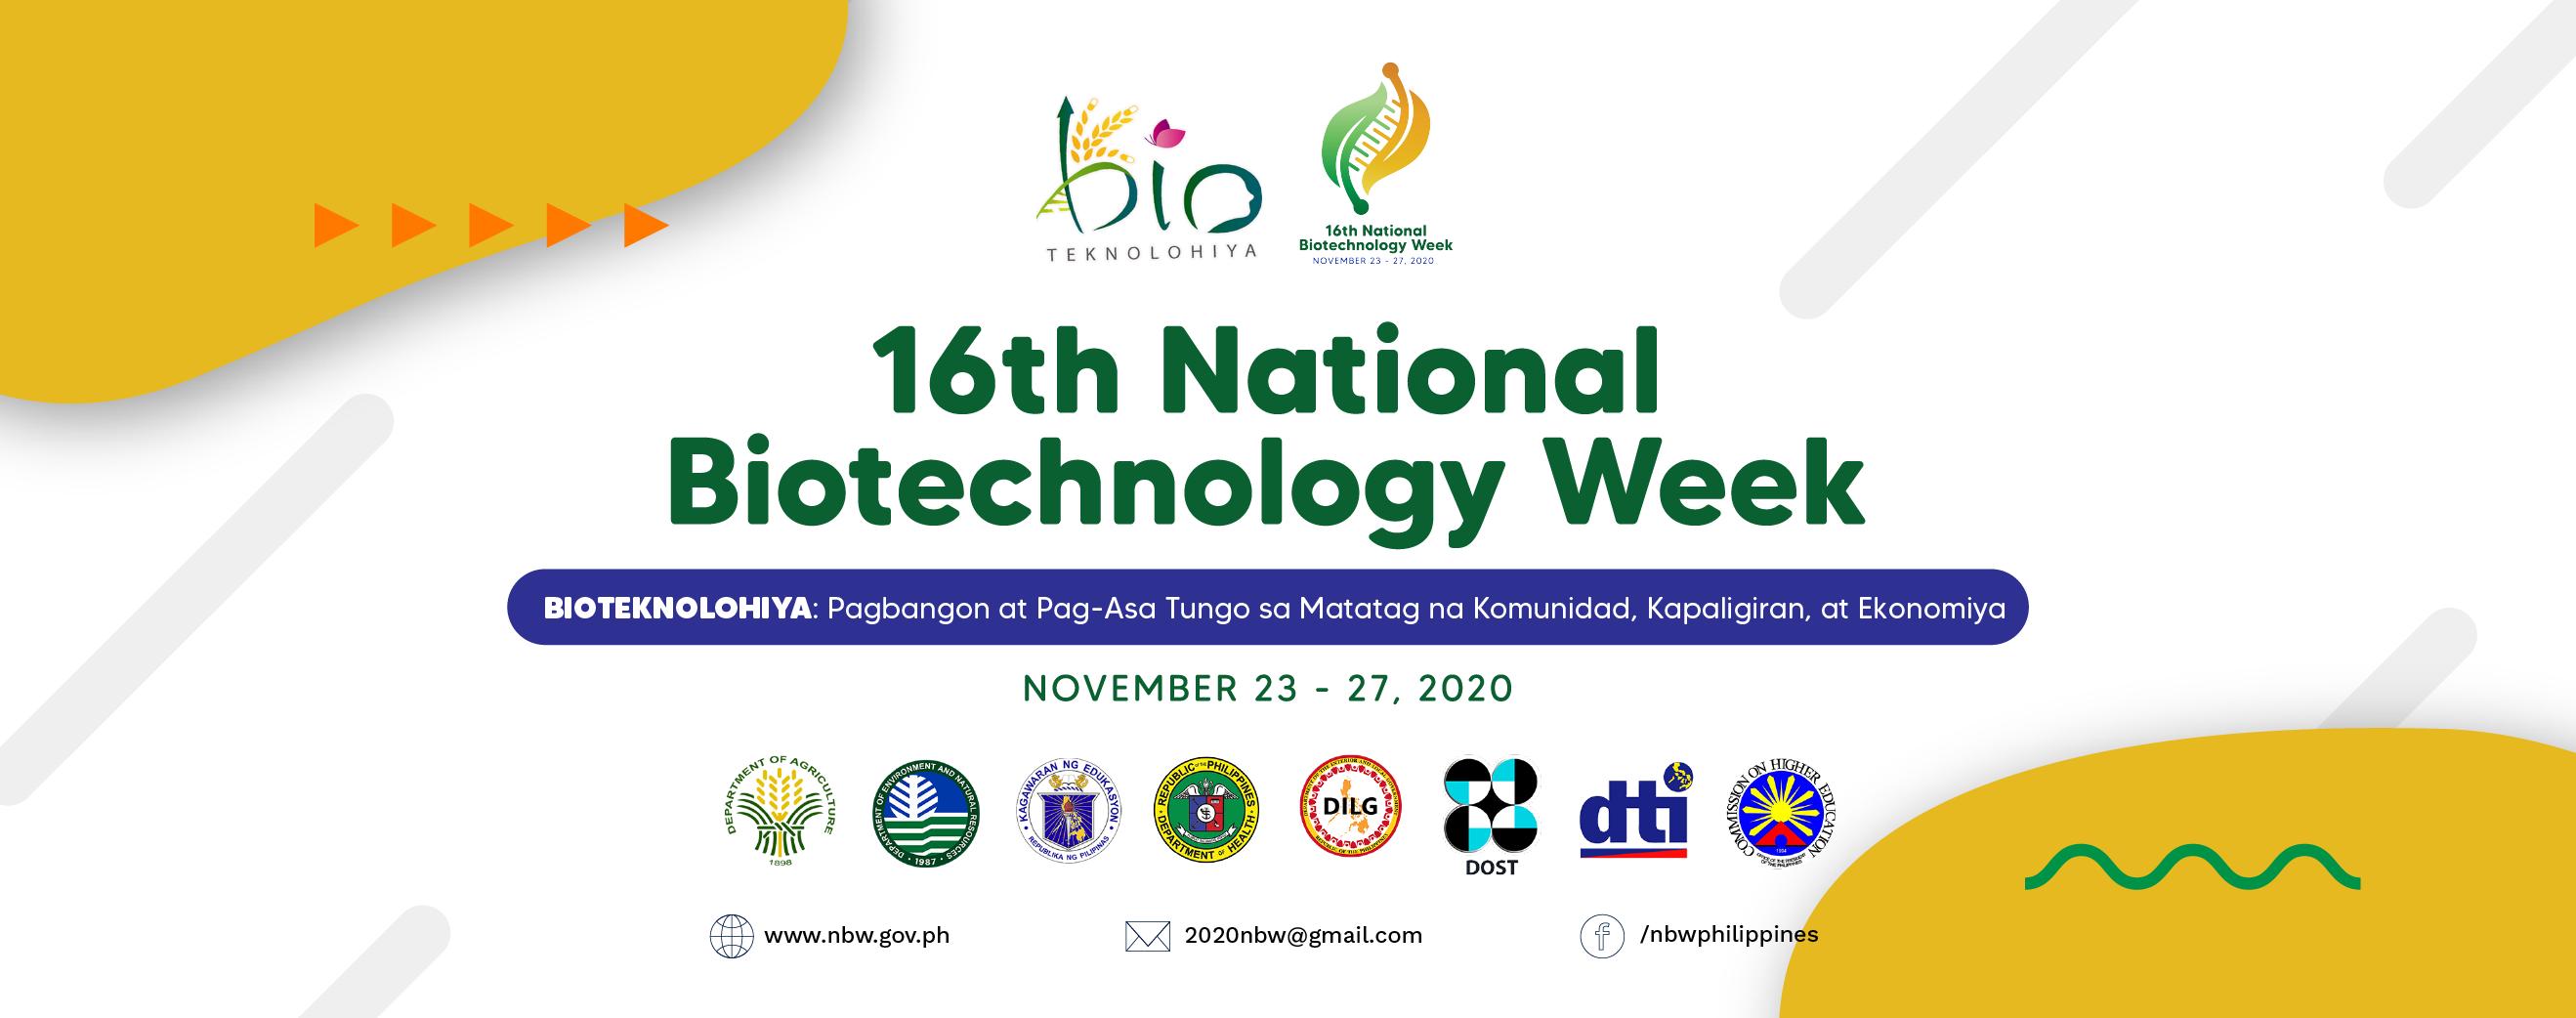 16th National Biotechnology Week